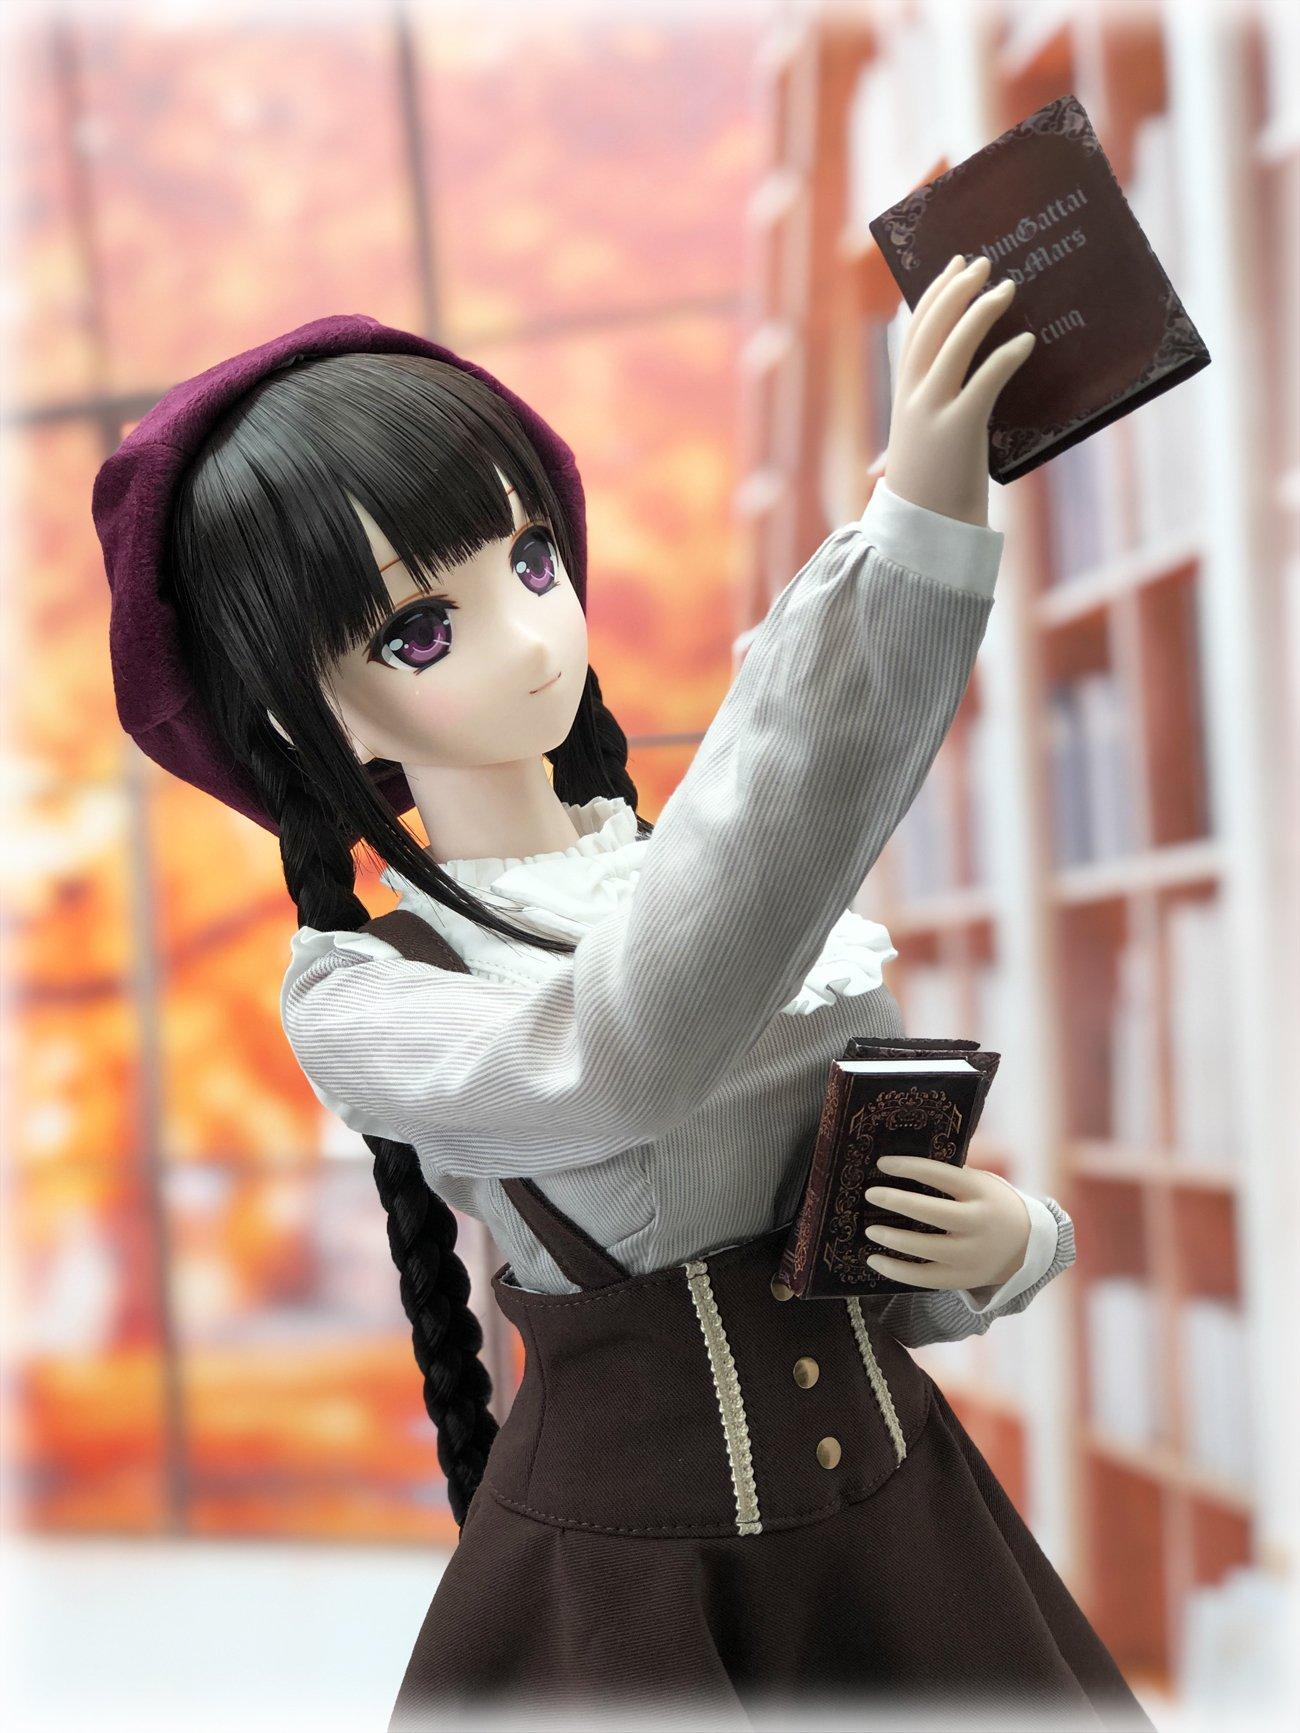 [Azone] 1/3 Happiness Clover - Yukari - Kazuharu Kina School Uniform Collection  Eevks010